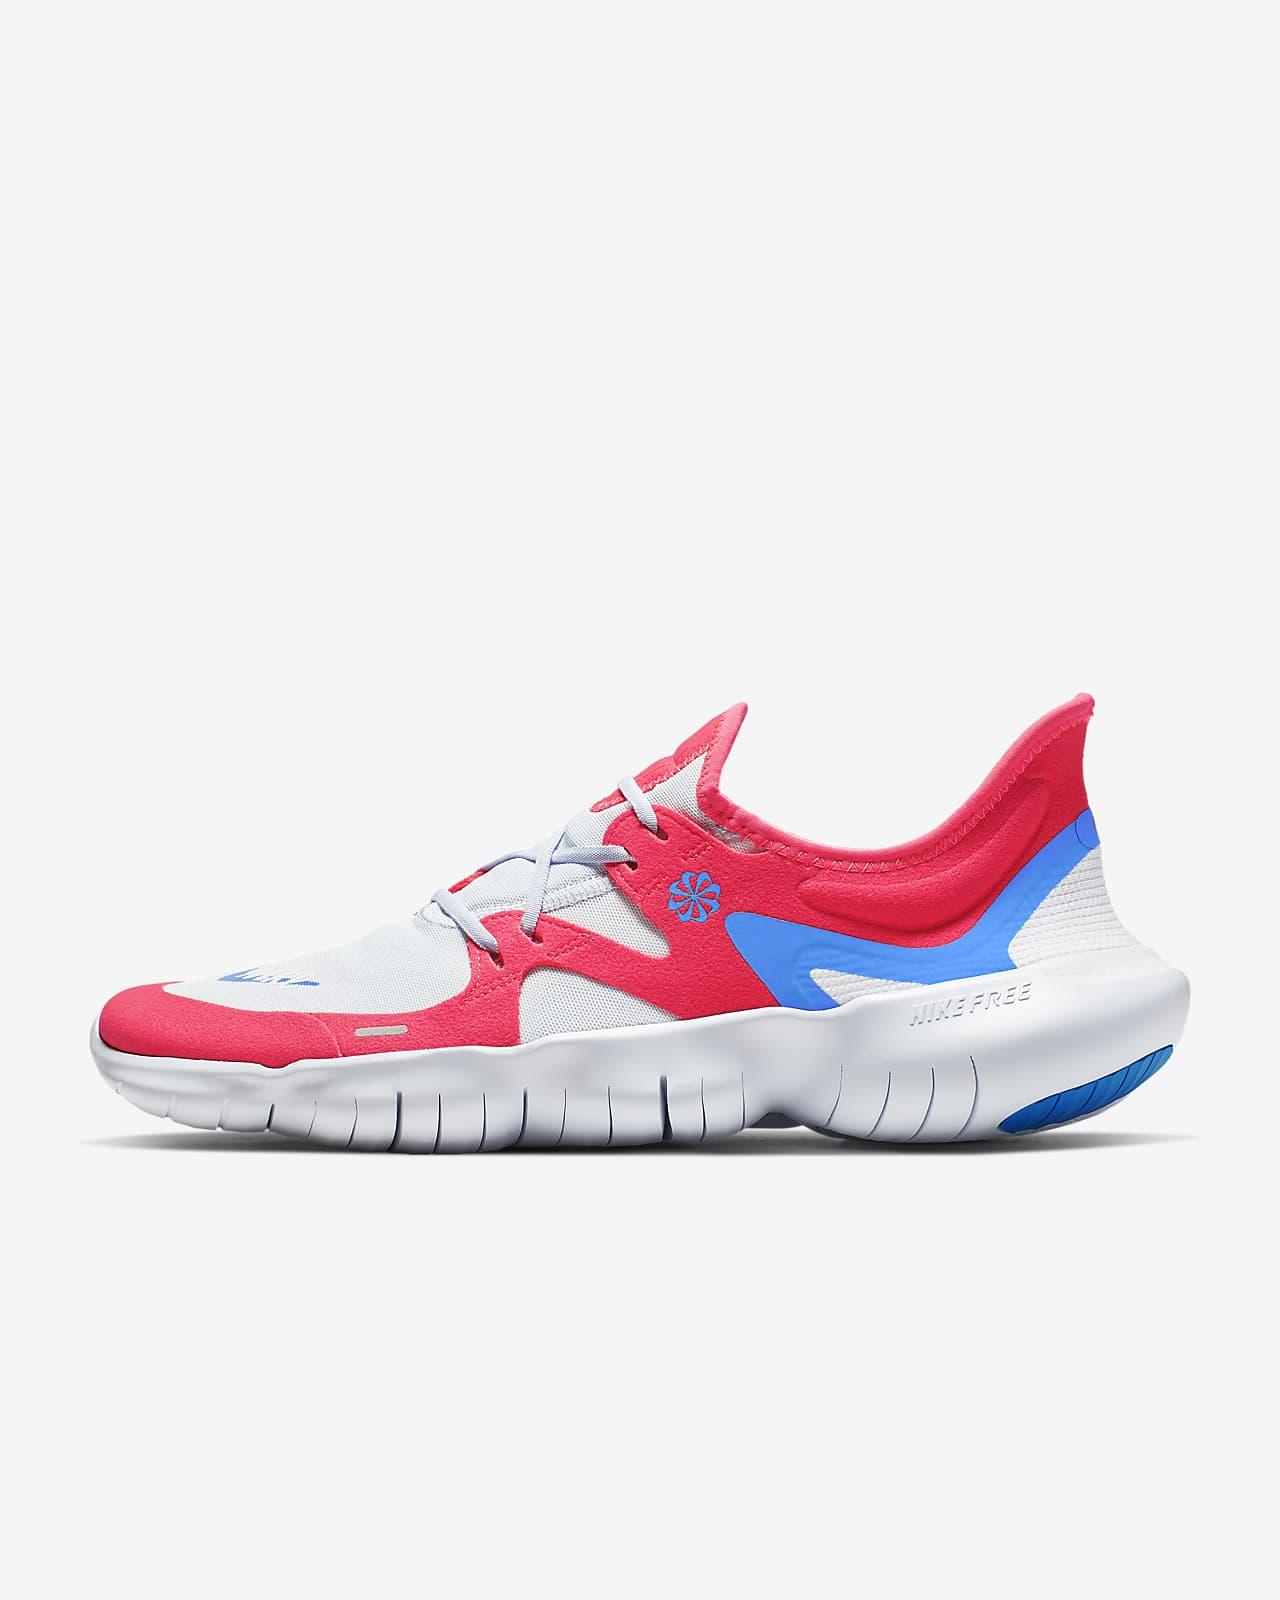 RN 5.0 Men's Running Shoe. Nike ID